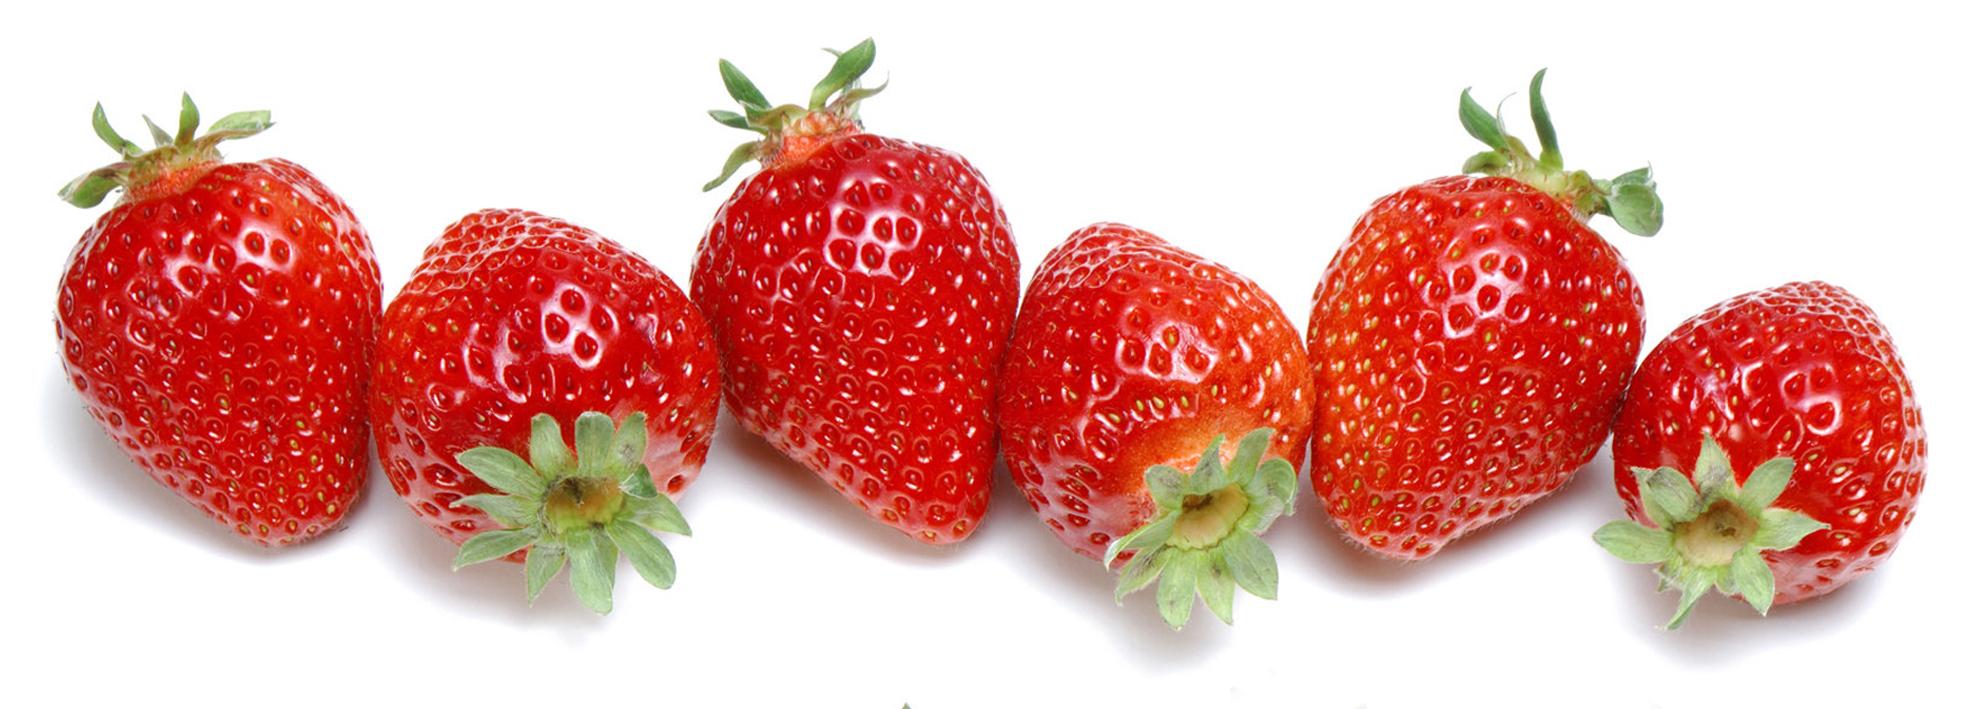 jordgubb.jpg